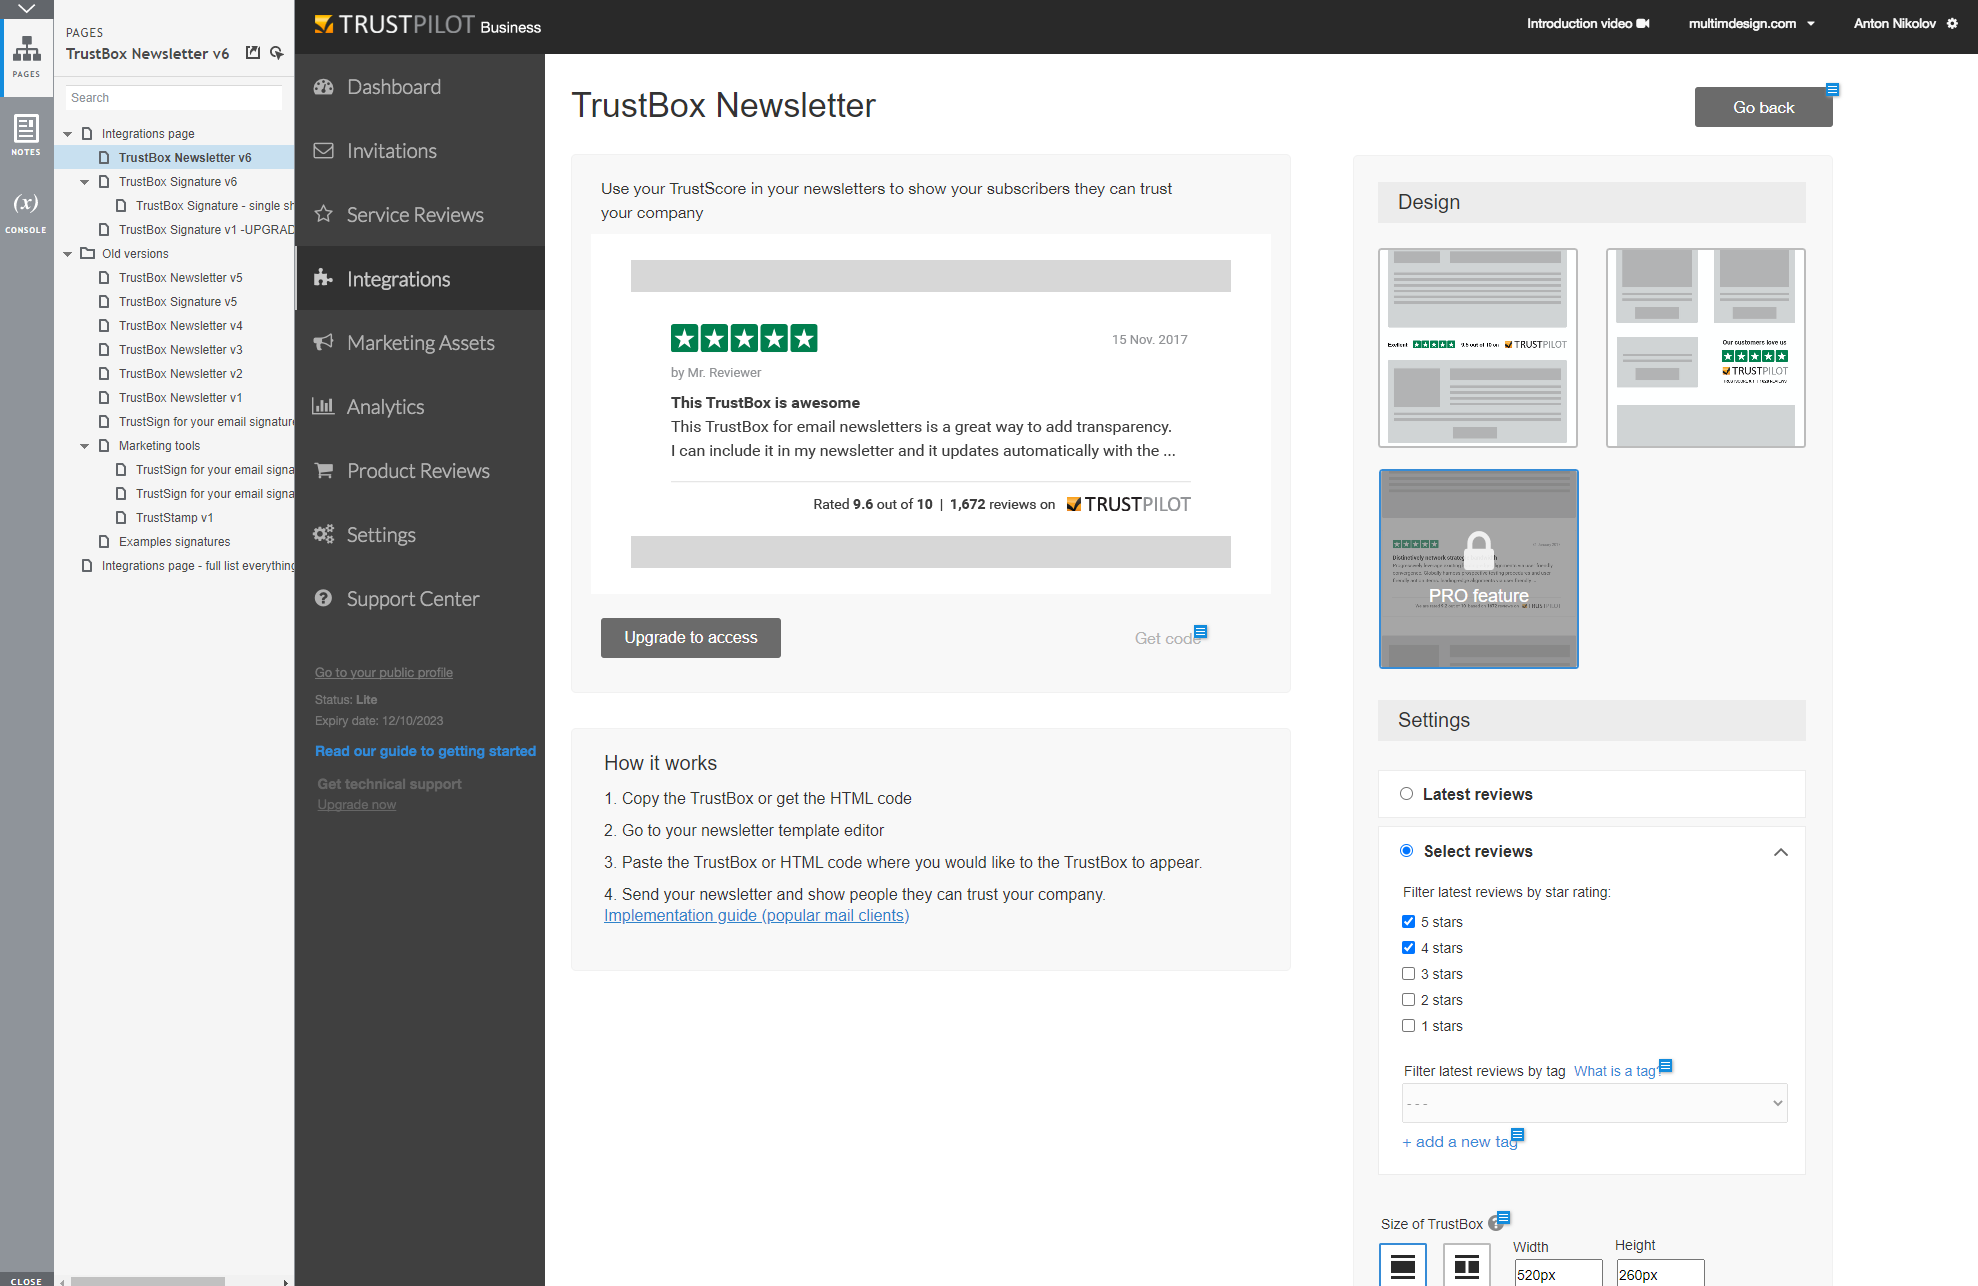 Trustbox Newsletter prototype